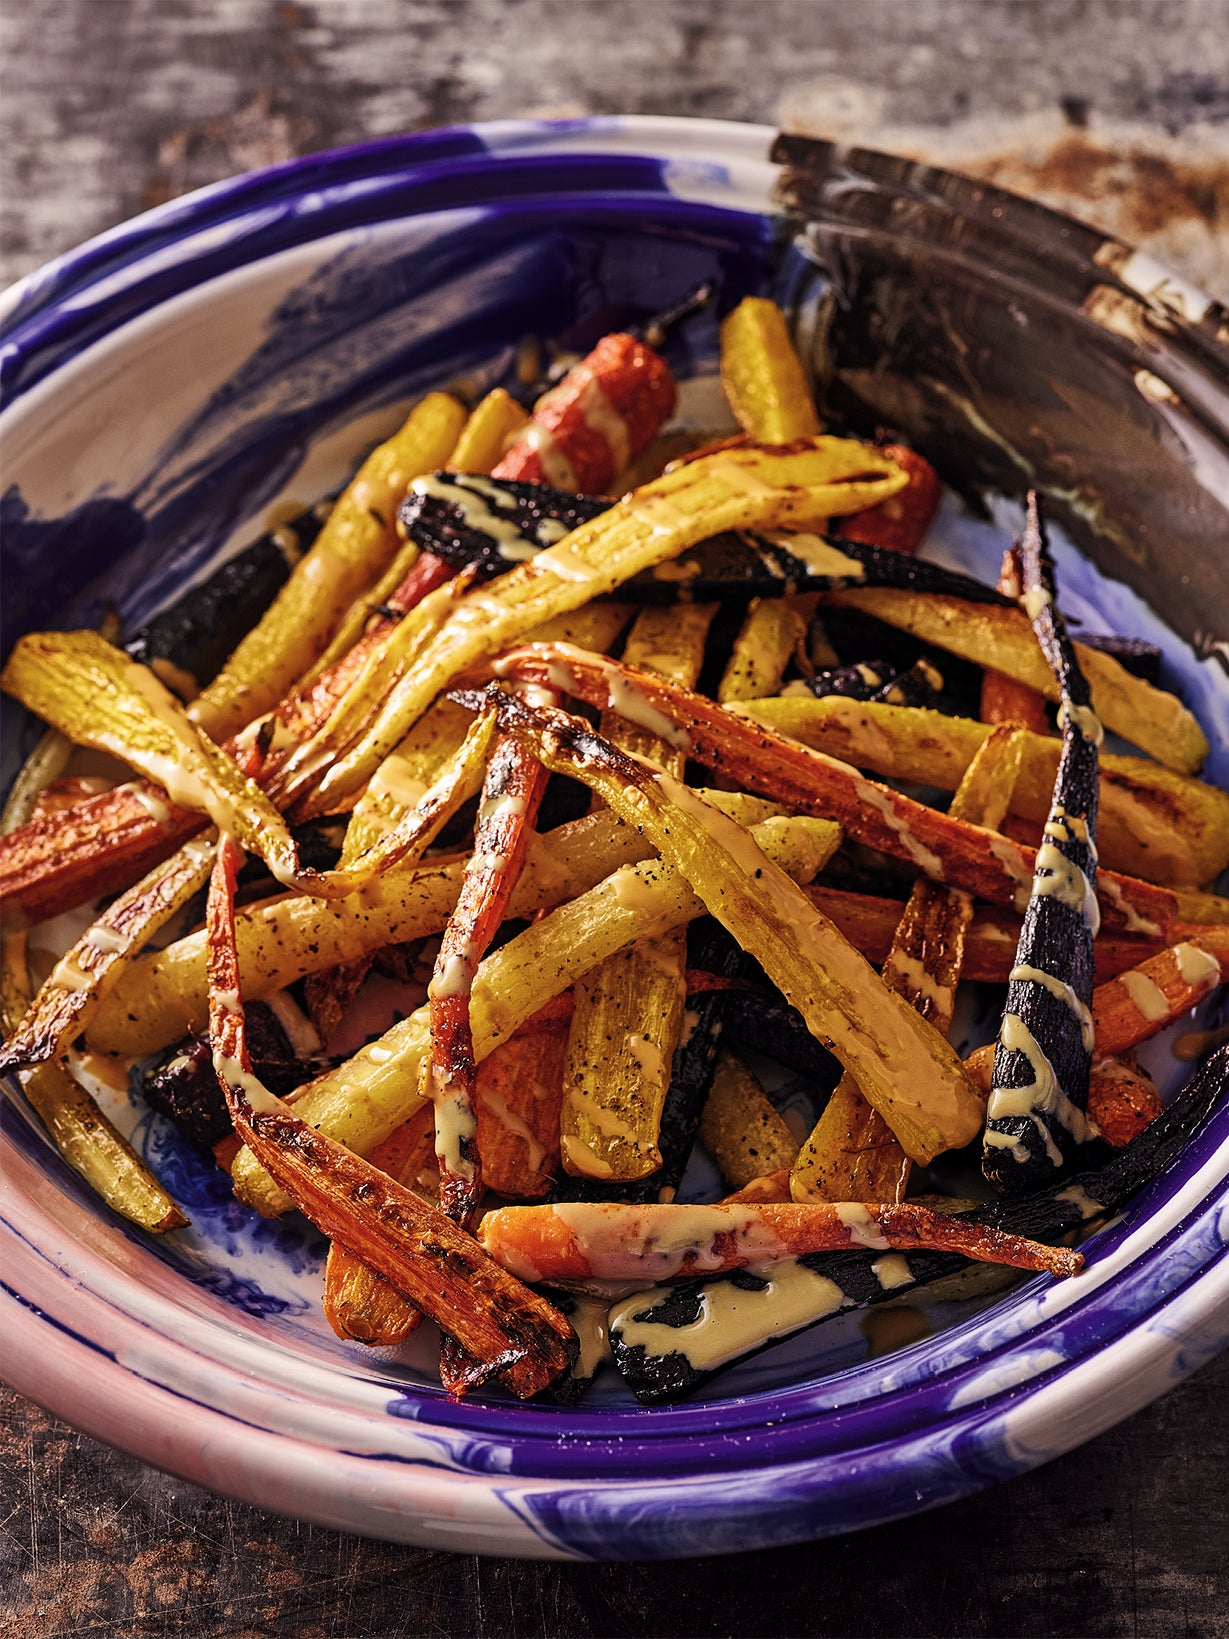 tahini-glazed-carrots-sababa-excerpt-domino